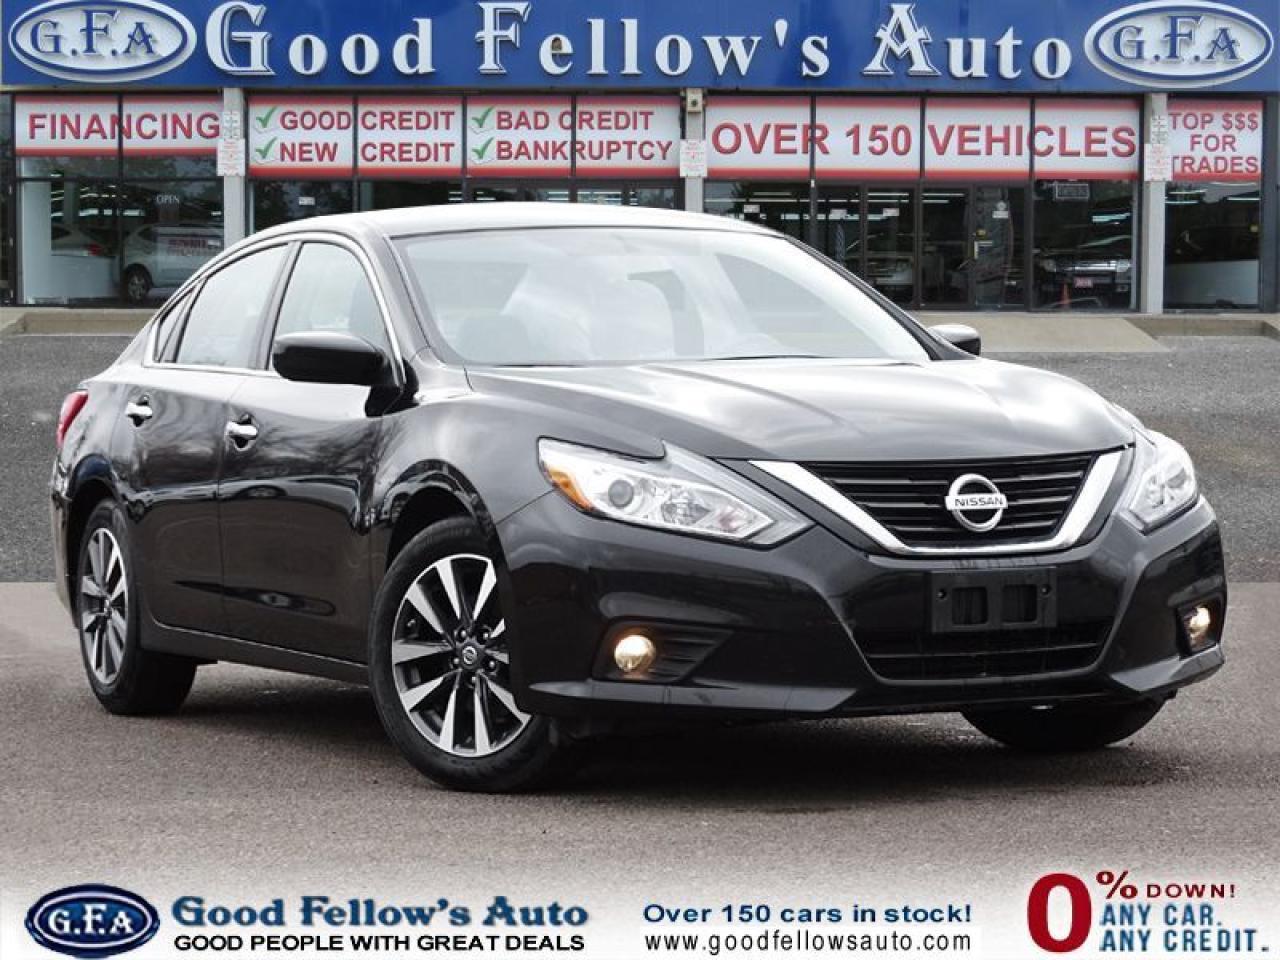 2017 Nissan Altima SV MODEL, SUNROOF, REARVIEW CAMERA, HEATED SEATS